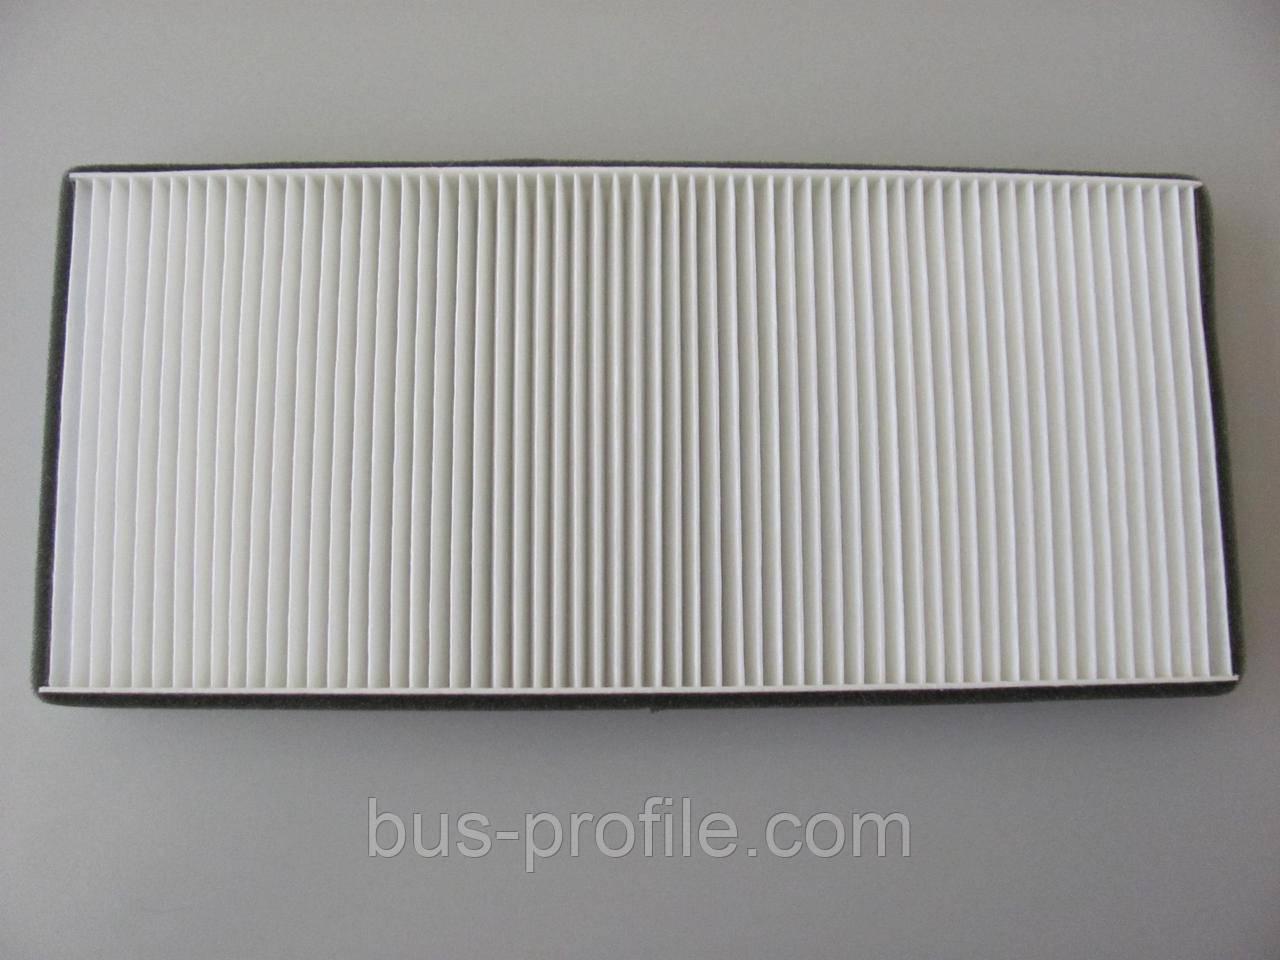 Фильтр салона на MB Sprinter, VW LT 1996-2006 — Wunder(Турция) — WP-700